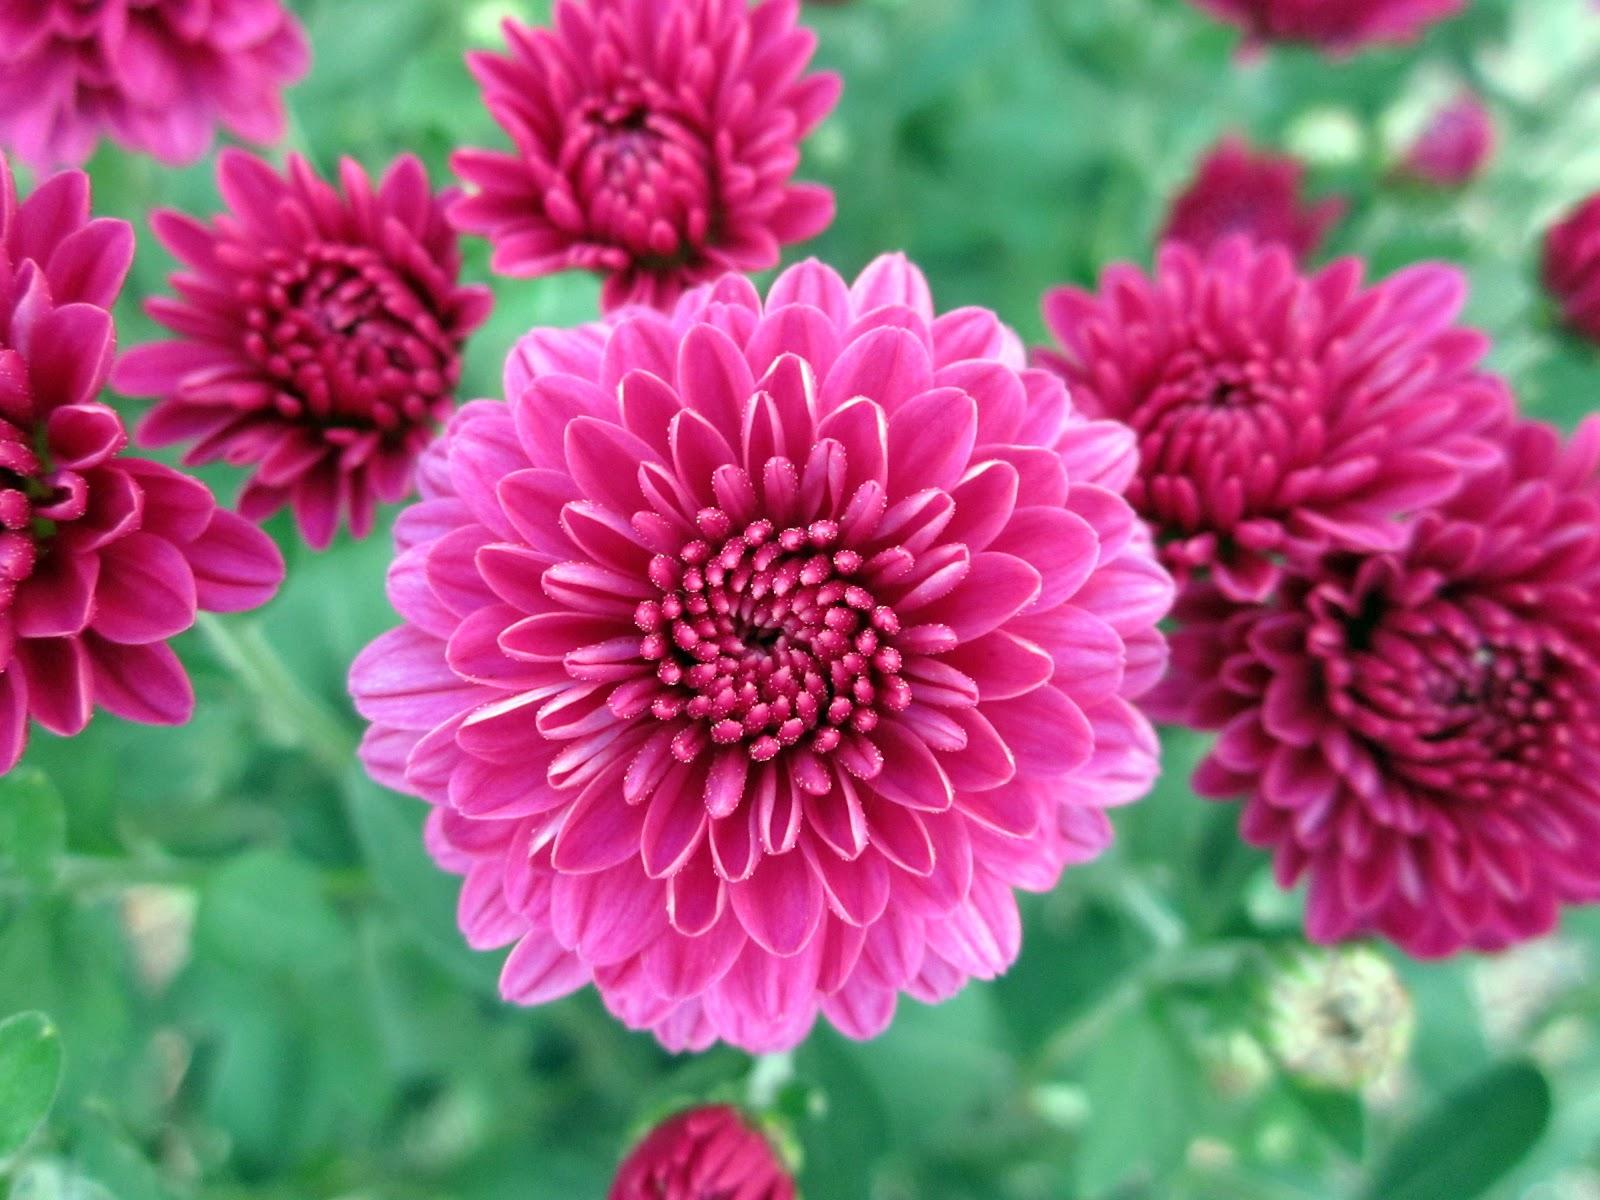 """The Chrysanthemums"" by John Steinbeck"